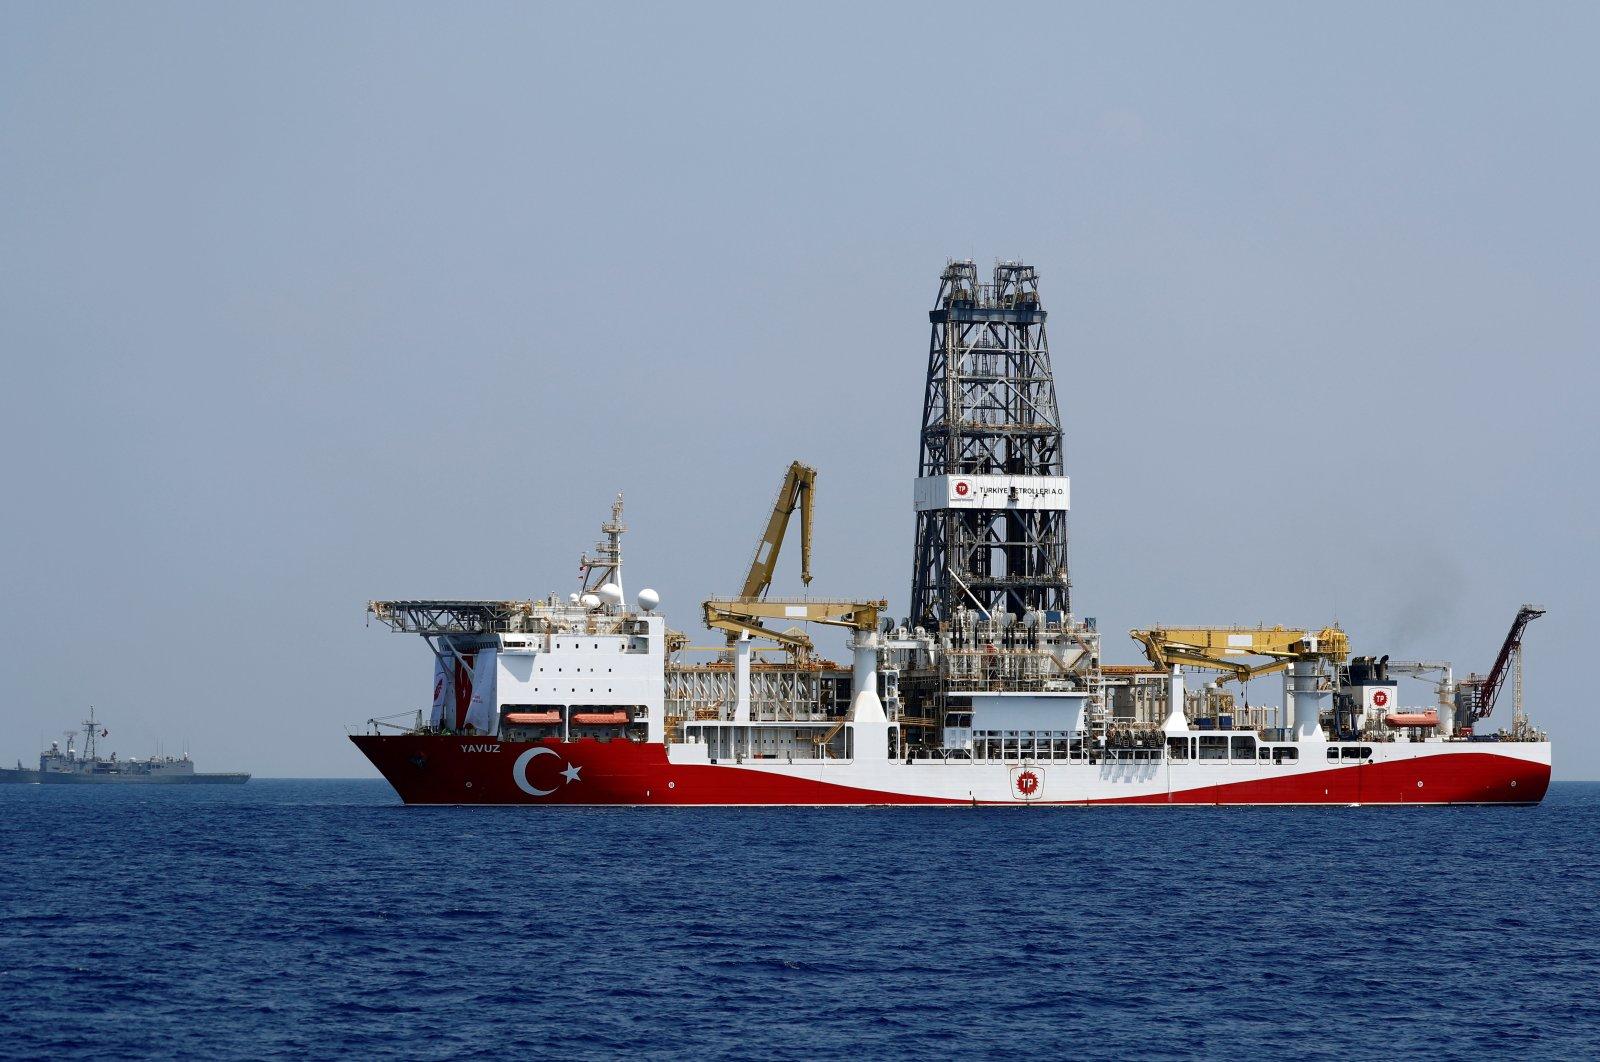 Turkish drilling vessel Yavuz is escorted by Turkish Navy frigate TCG Gemlik (F-492) in the eastern Mediterranean Sea off Cyprus, August 6, 2019. (REUTERS Photo)